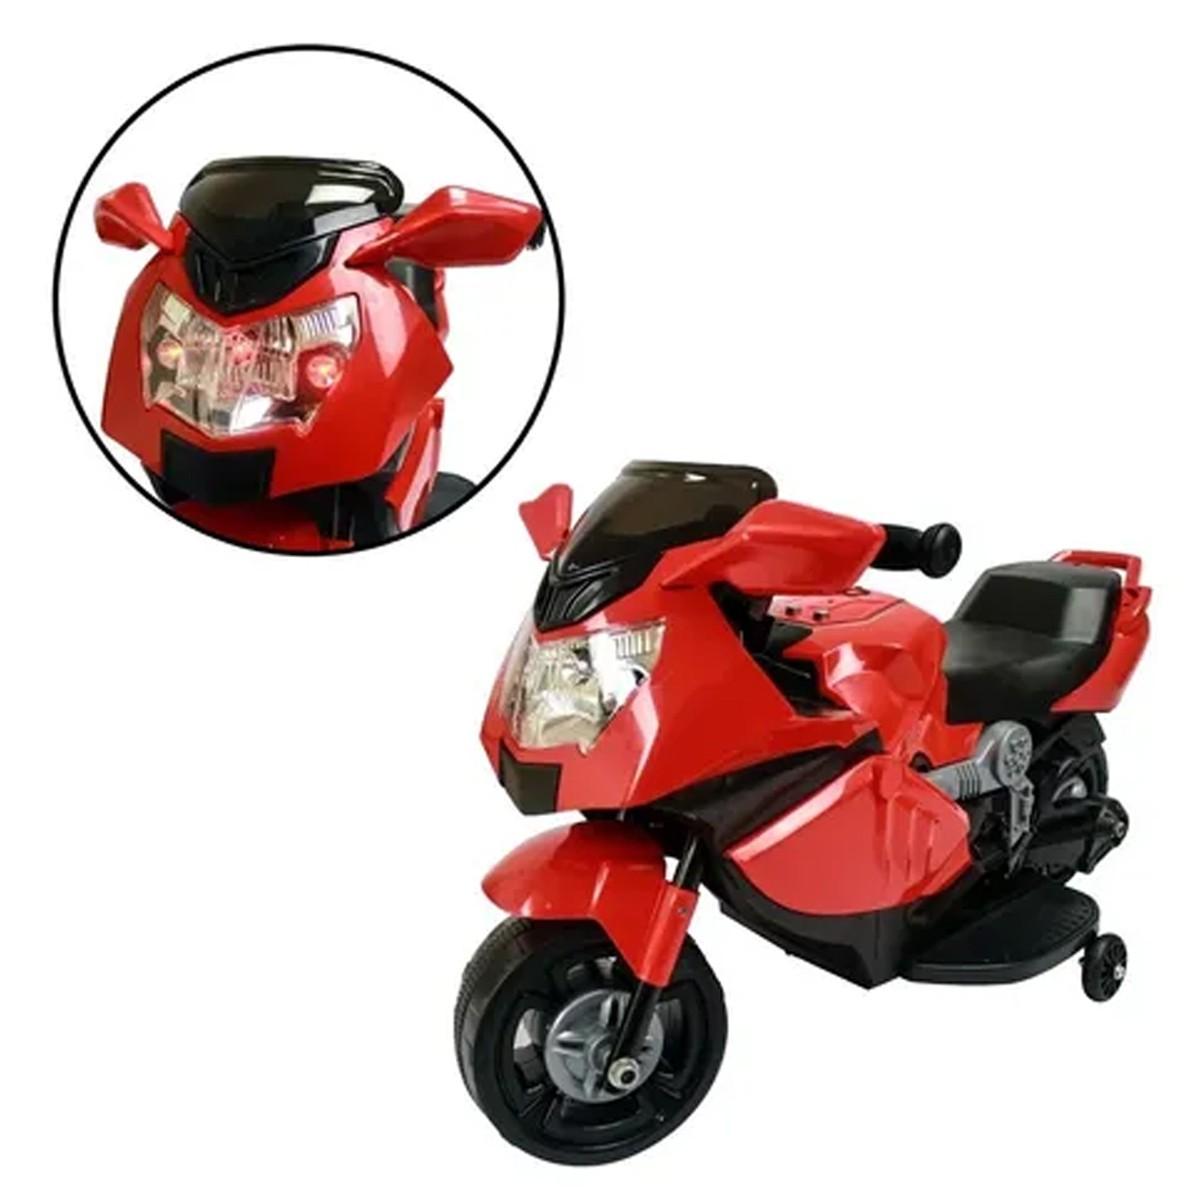 Mini Moto Elétrica Infantil Vermelha Importway